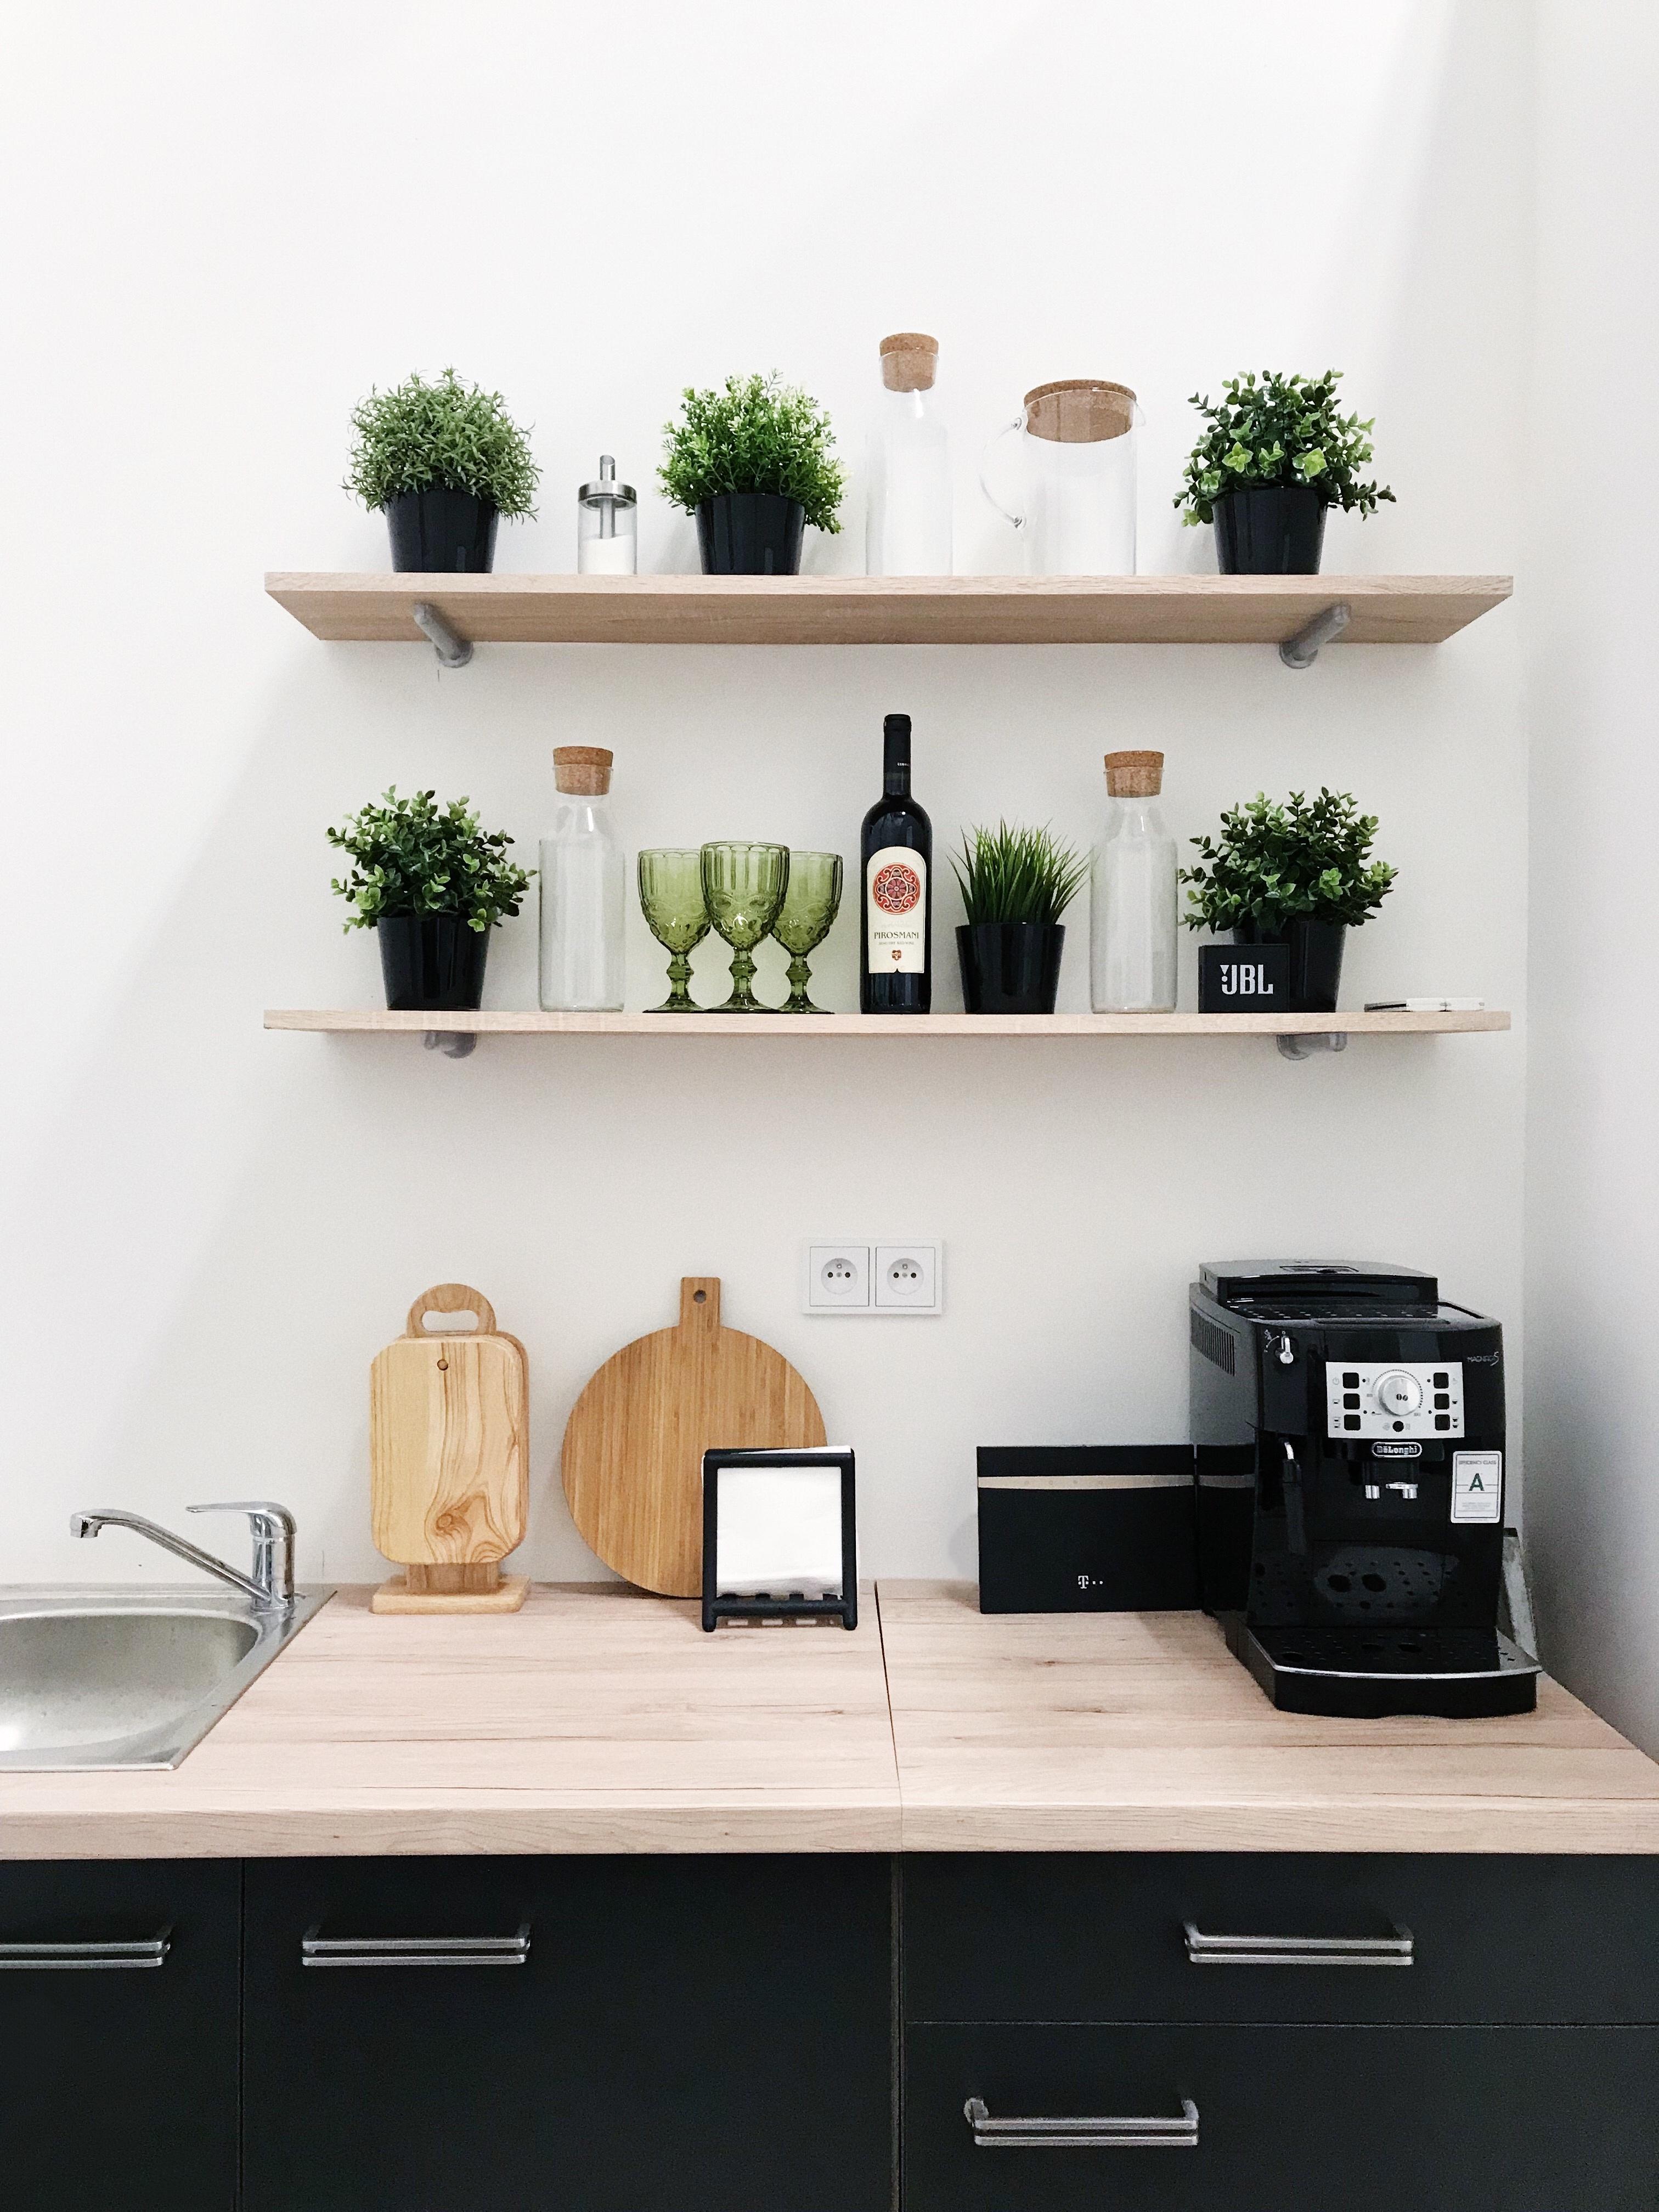 Fotoateliér Swan Studio - interiér - kuchyň